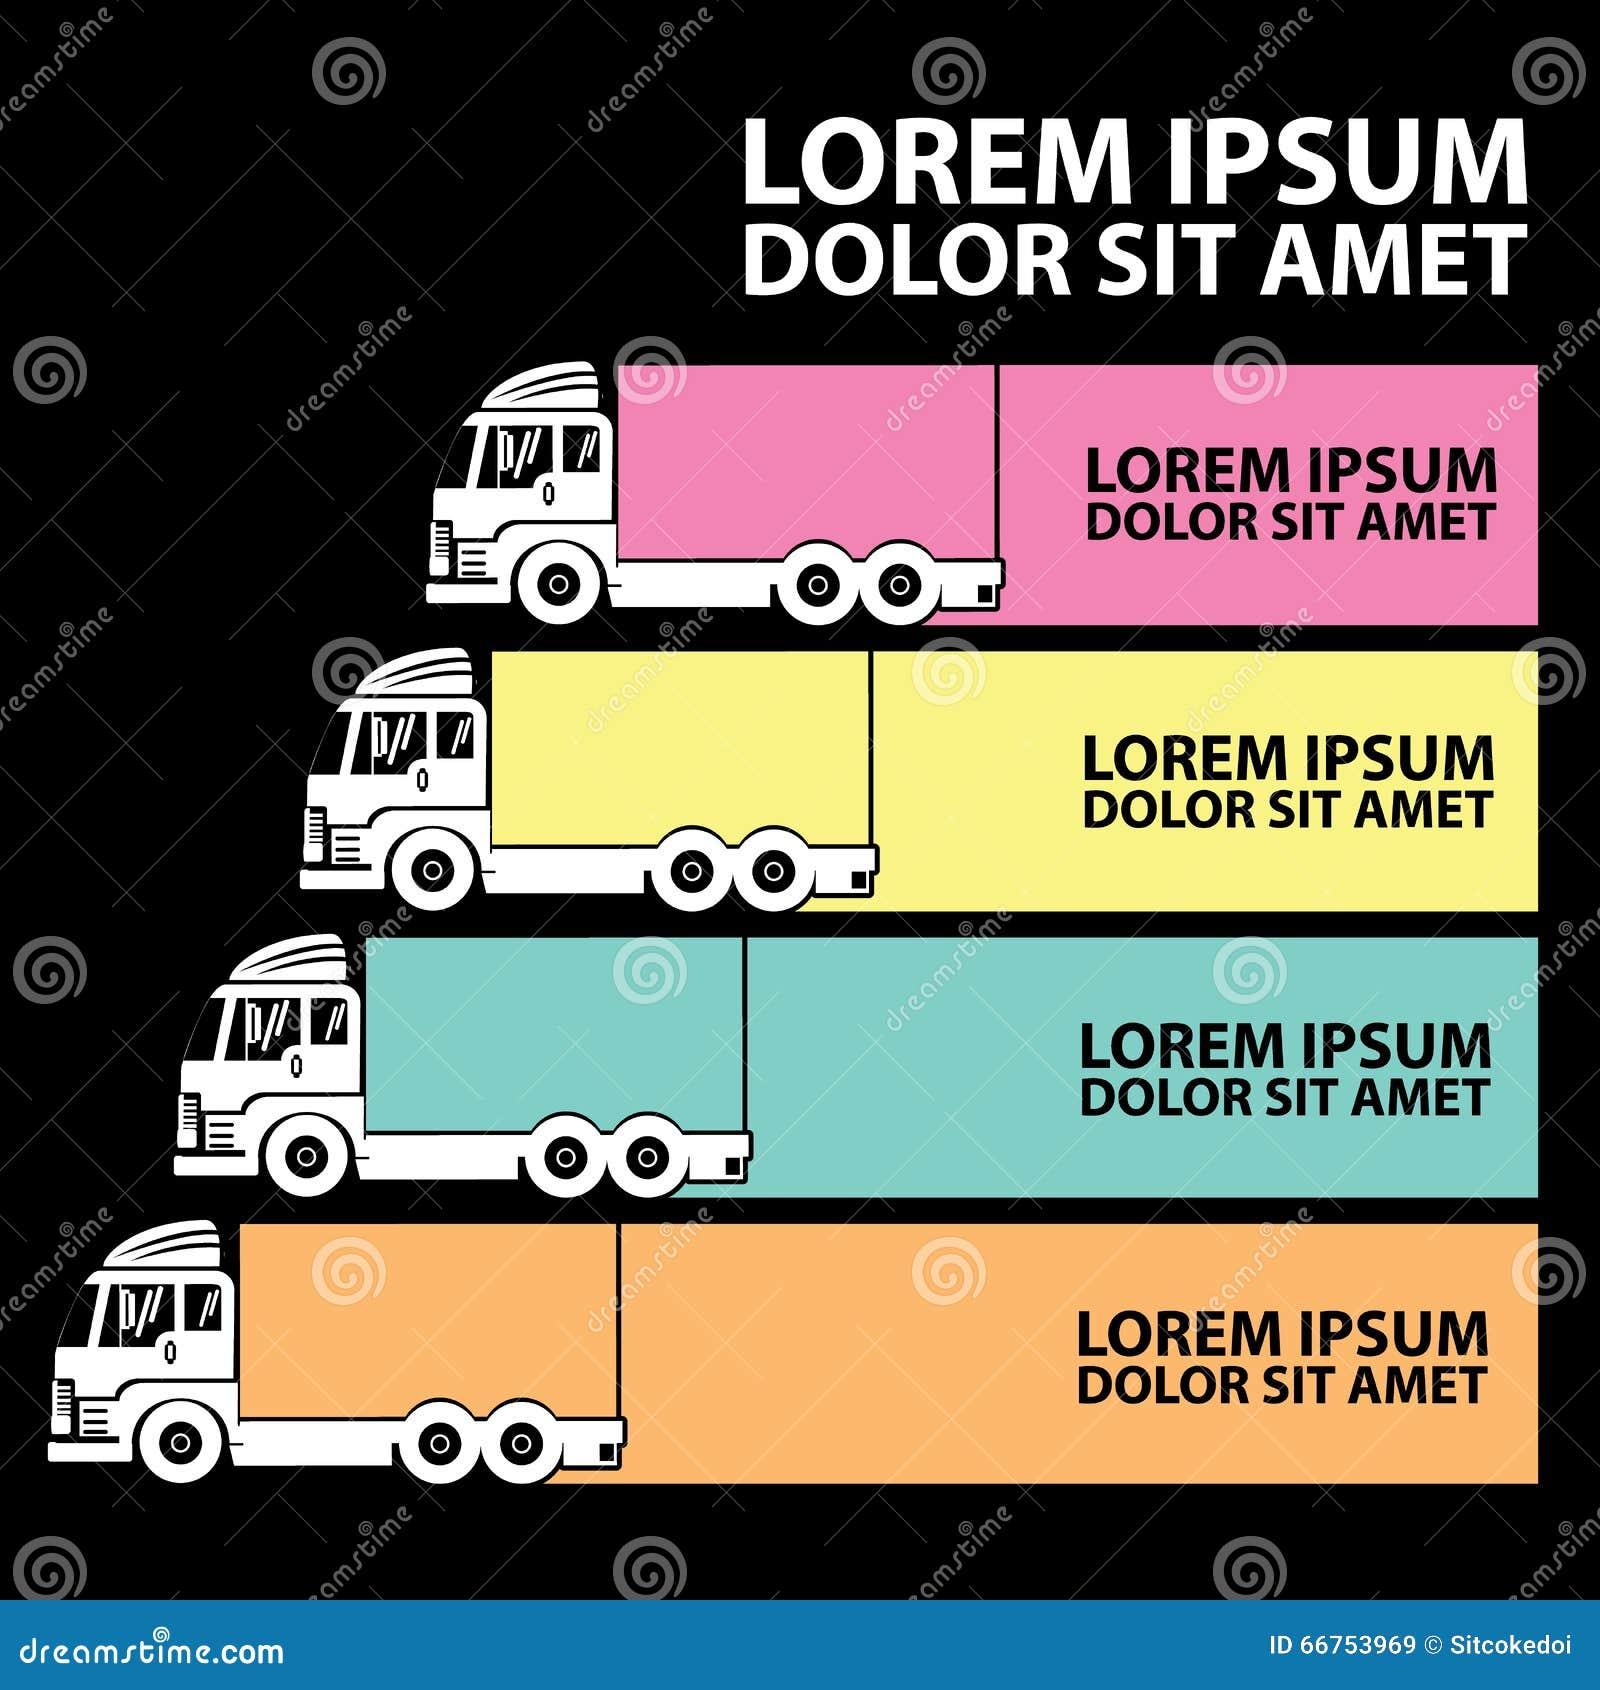 Schön Diagramm Des Motors Ideen - Schaltplan Serie Circuit ...